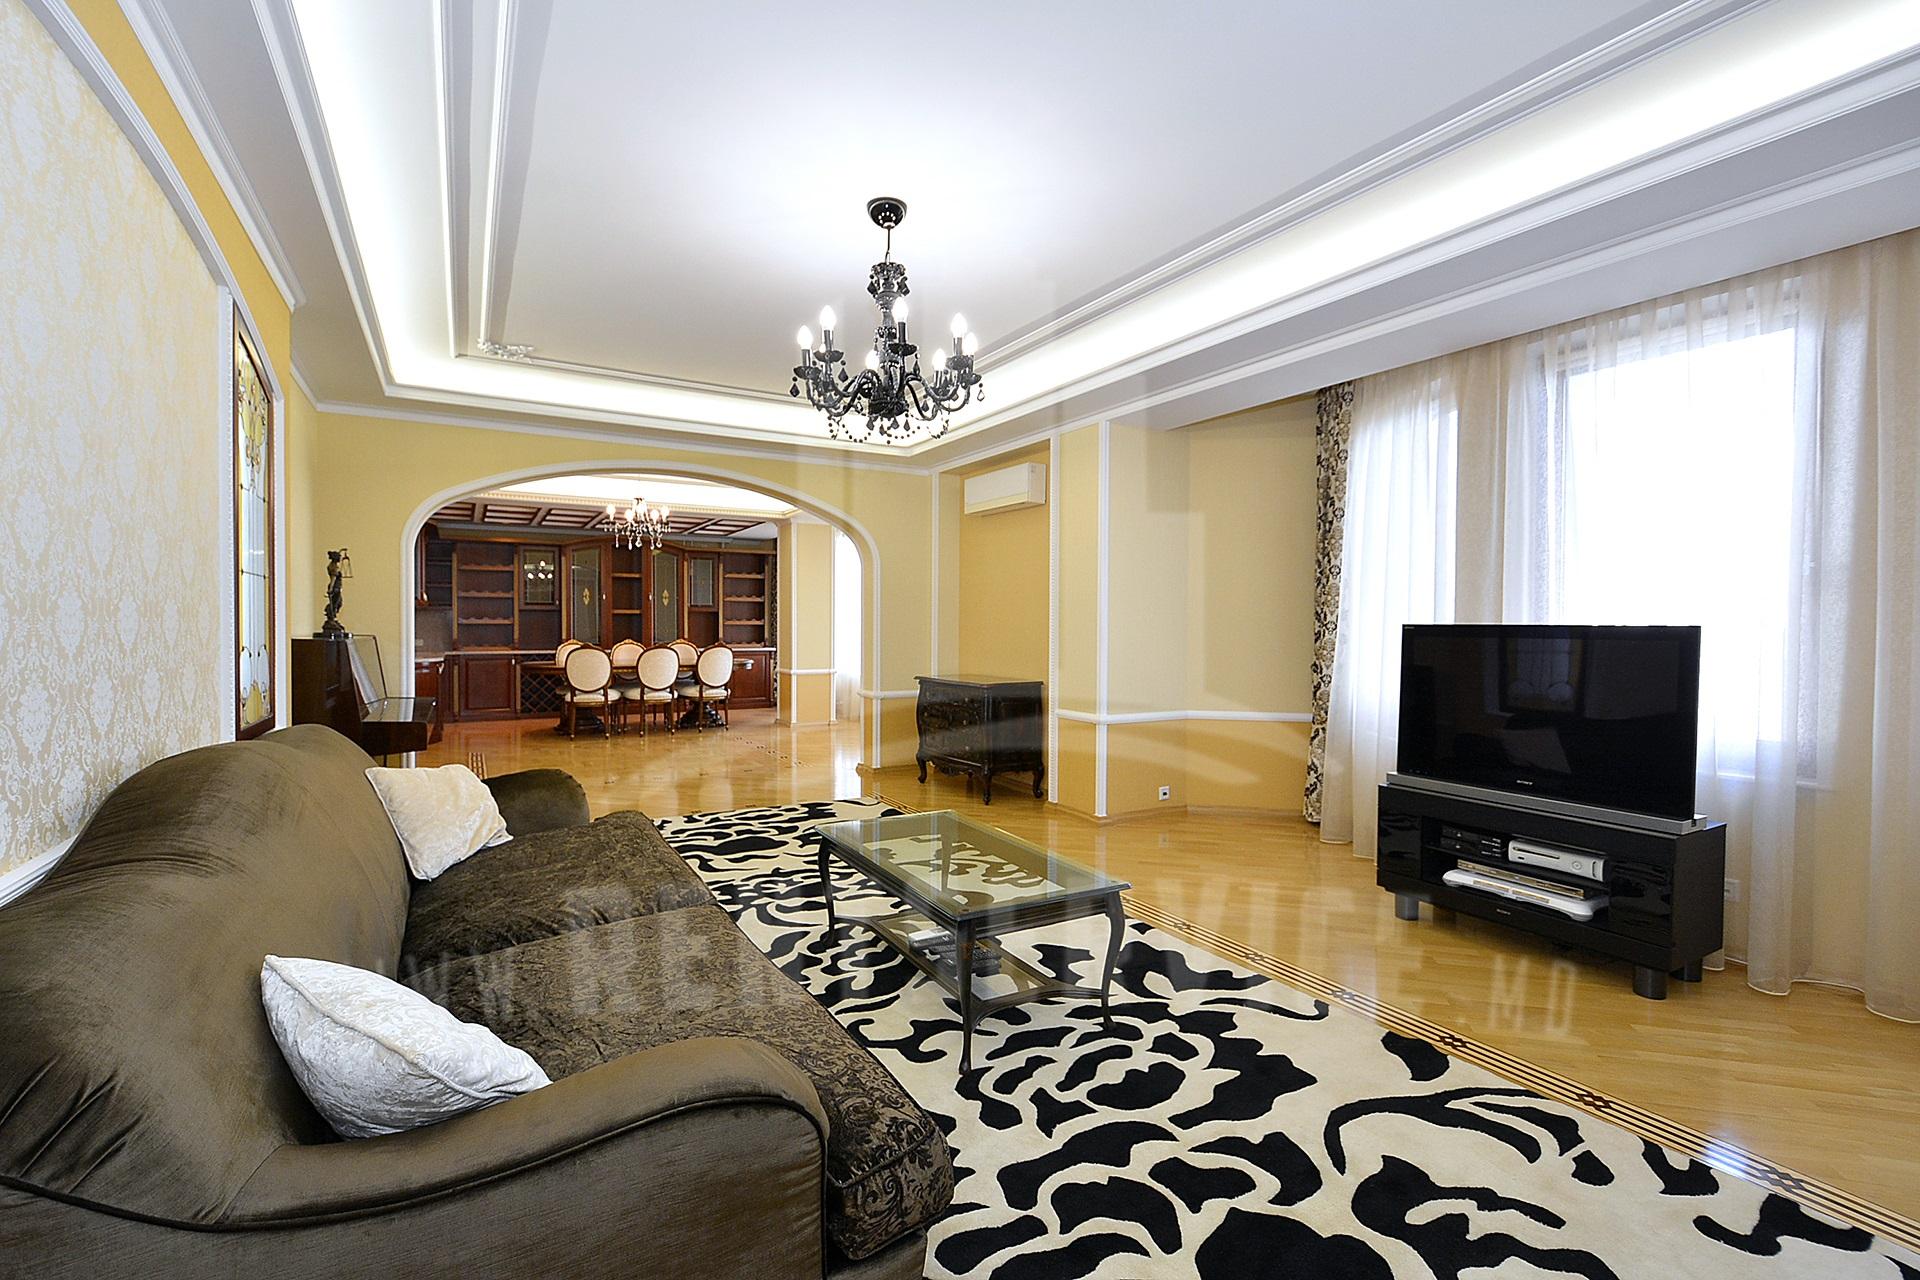 284_apartment_front.JPG